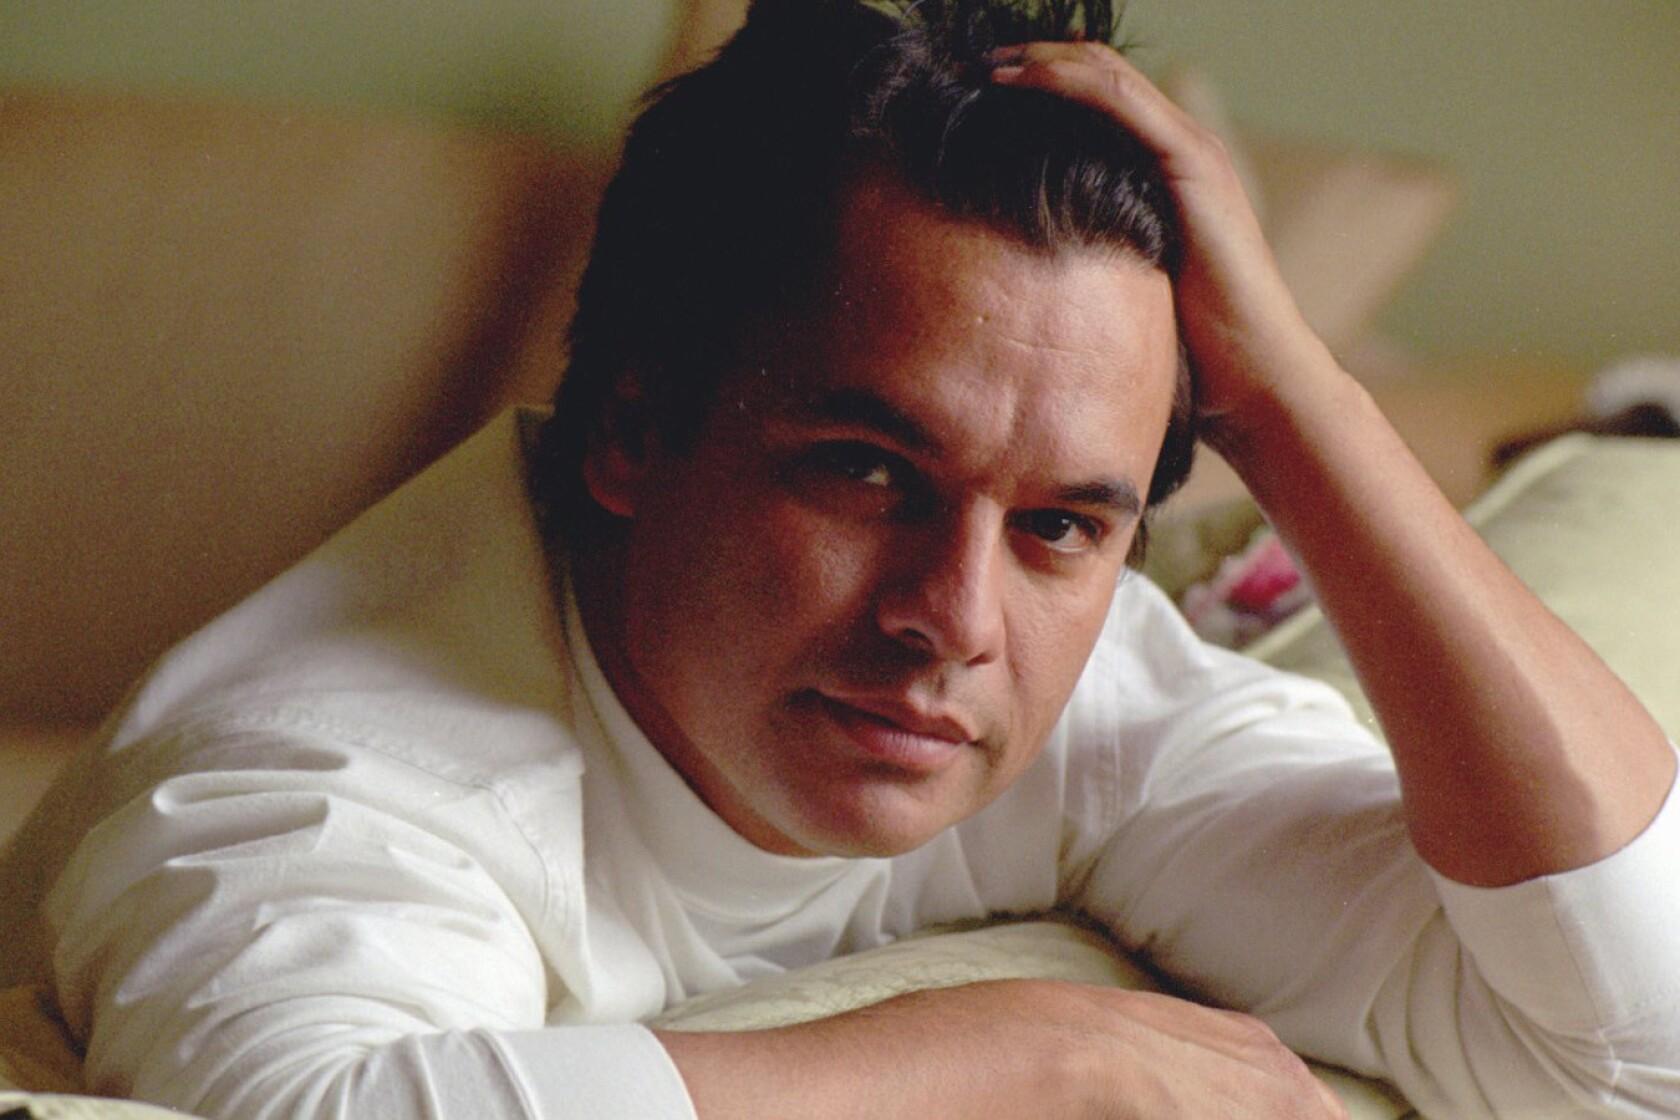 Juan Gabriel, superstar Mexican singer and songwriter, dies